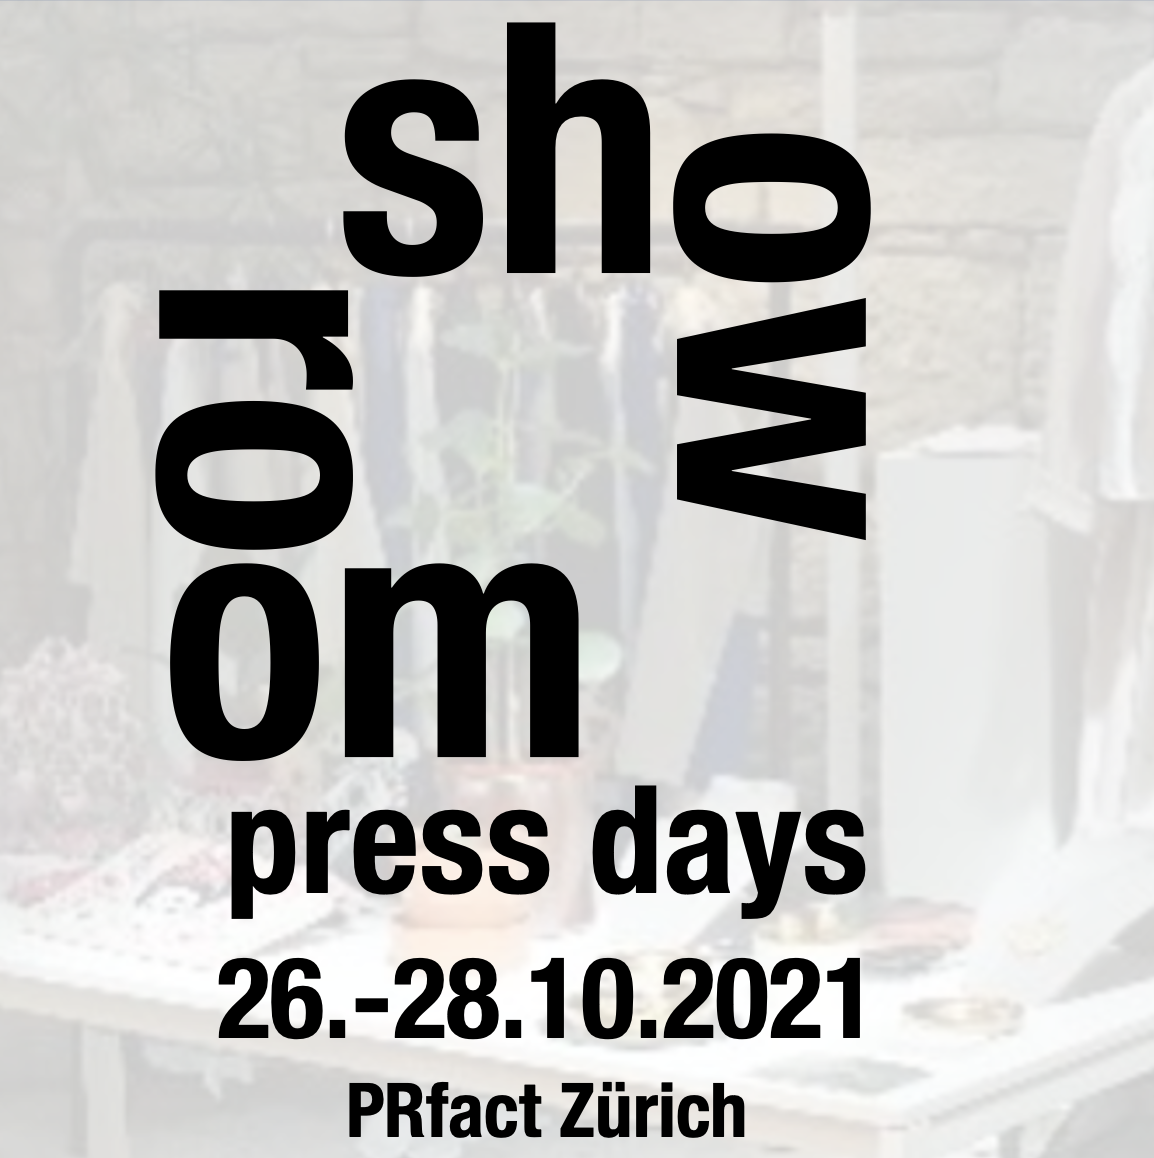 SFA showroom @ press days